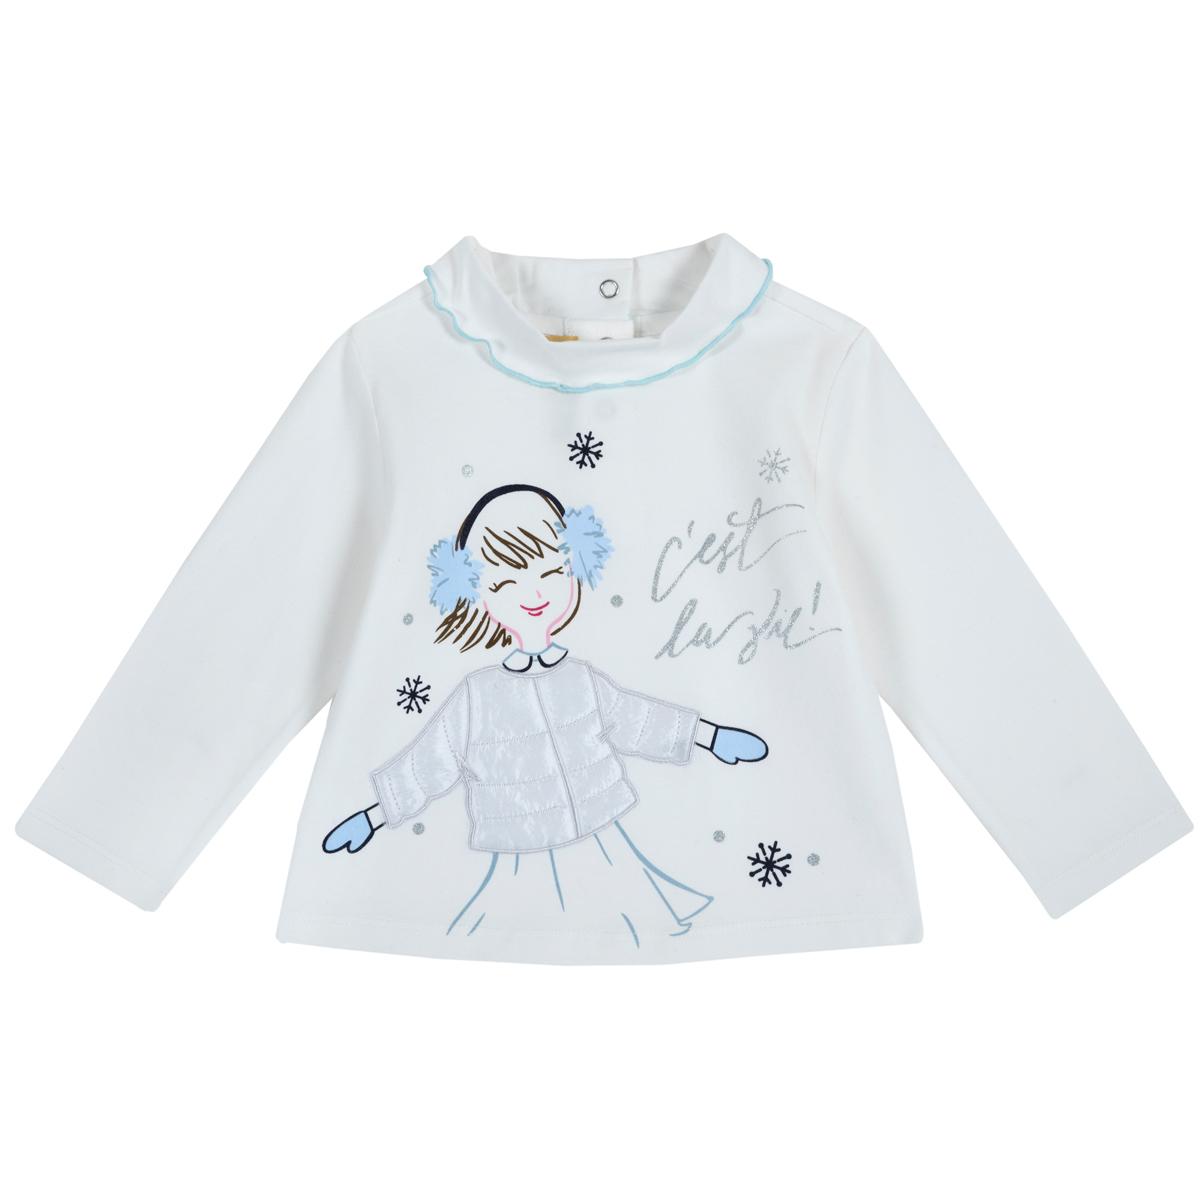 Tricou copii Chicco, maneca lunga, alb, 06779 din categoria Tricouri copii